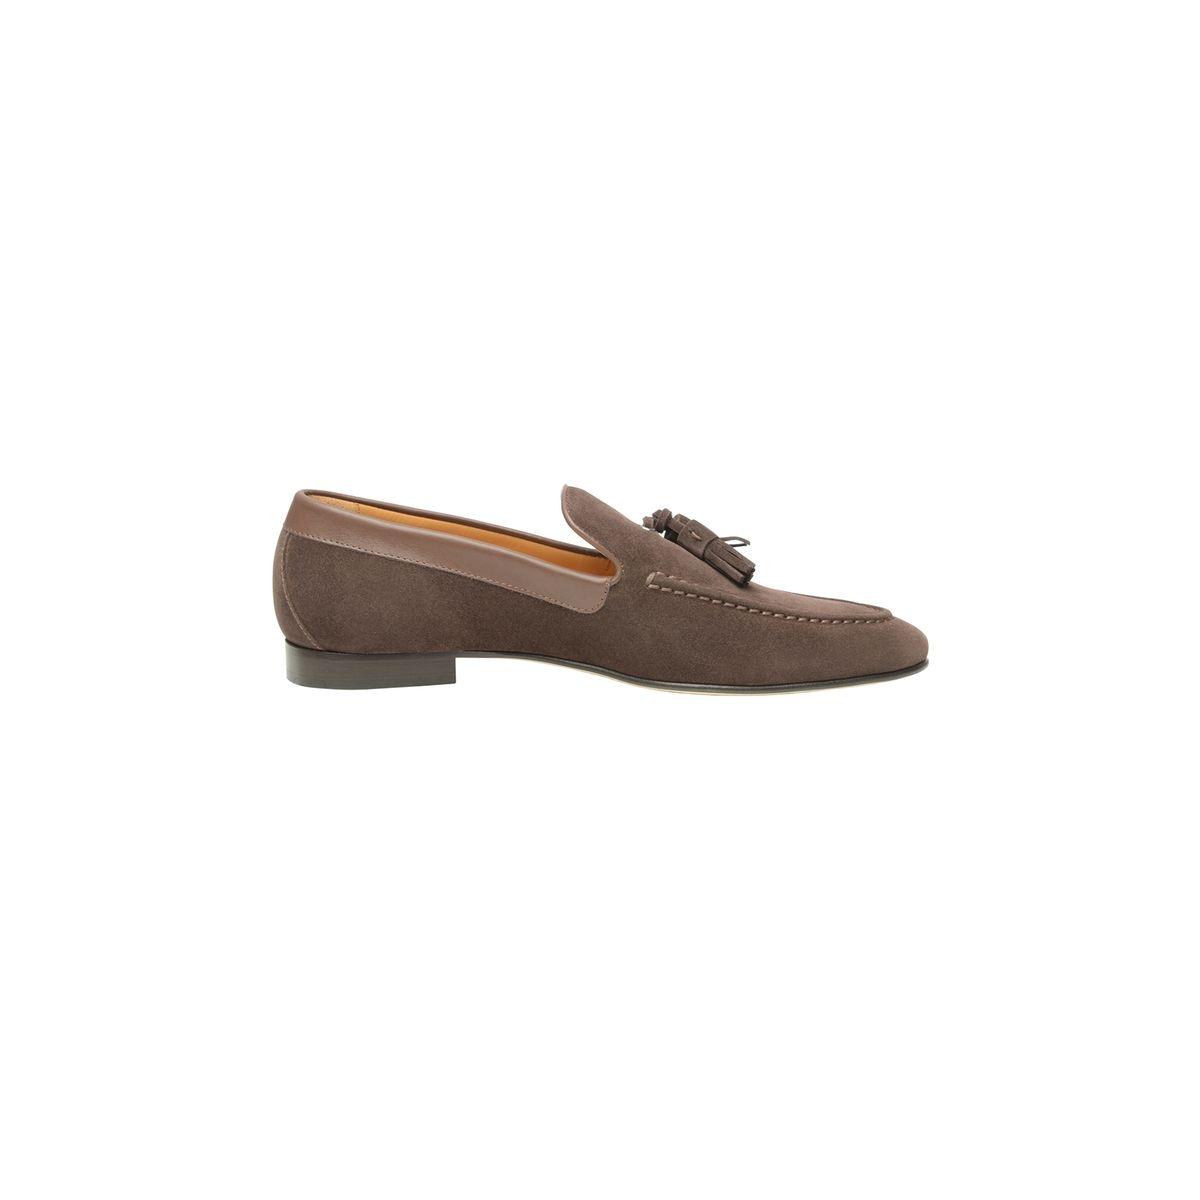 Loafer en velours marron foncé